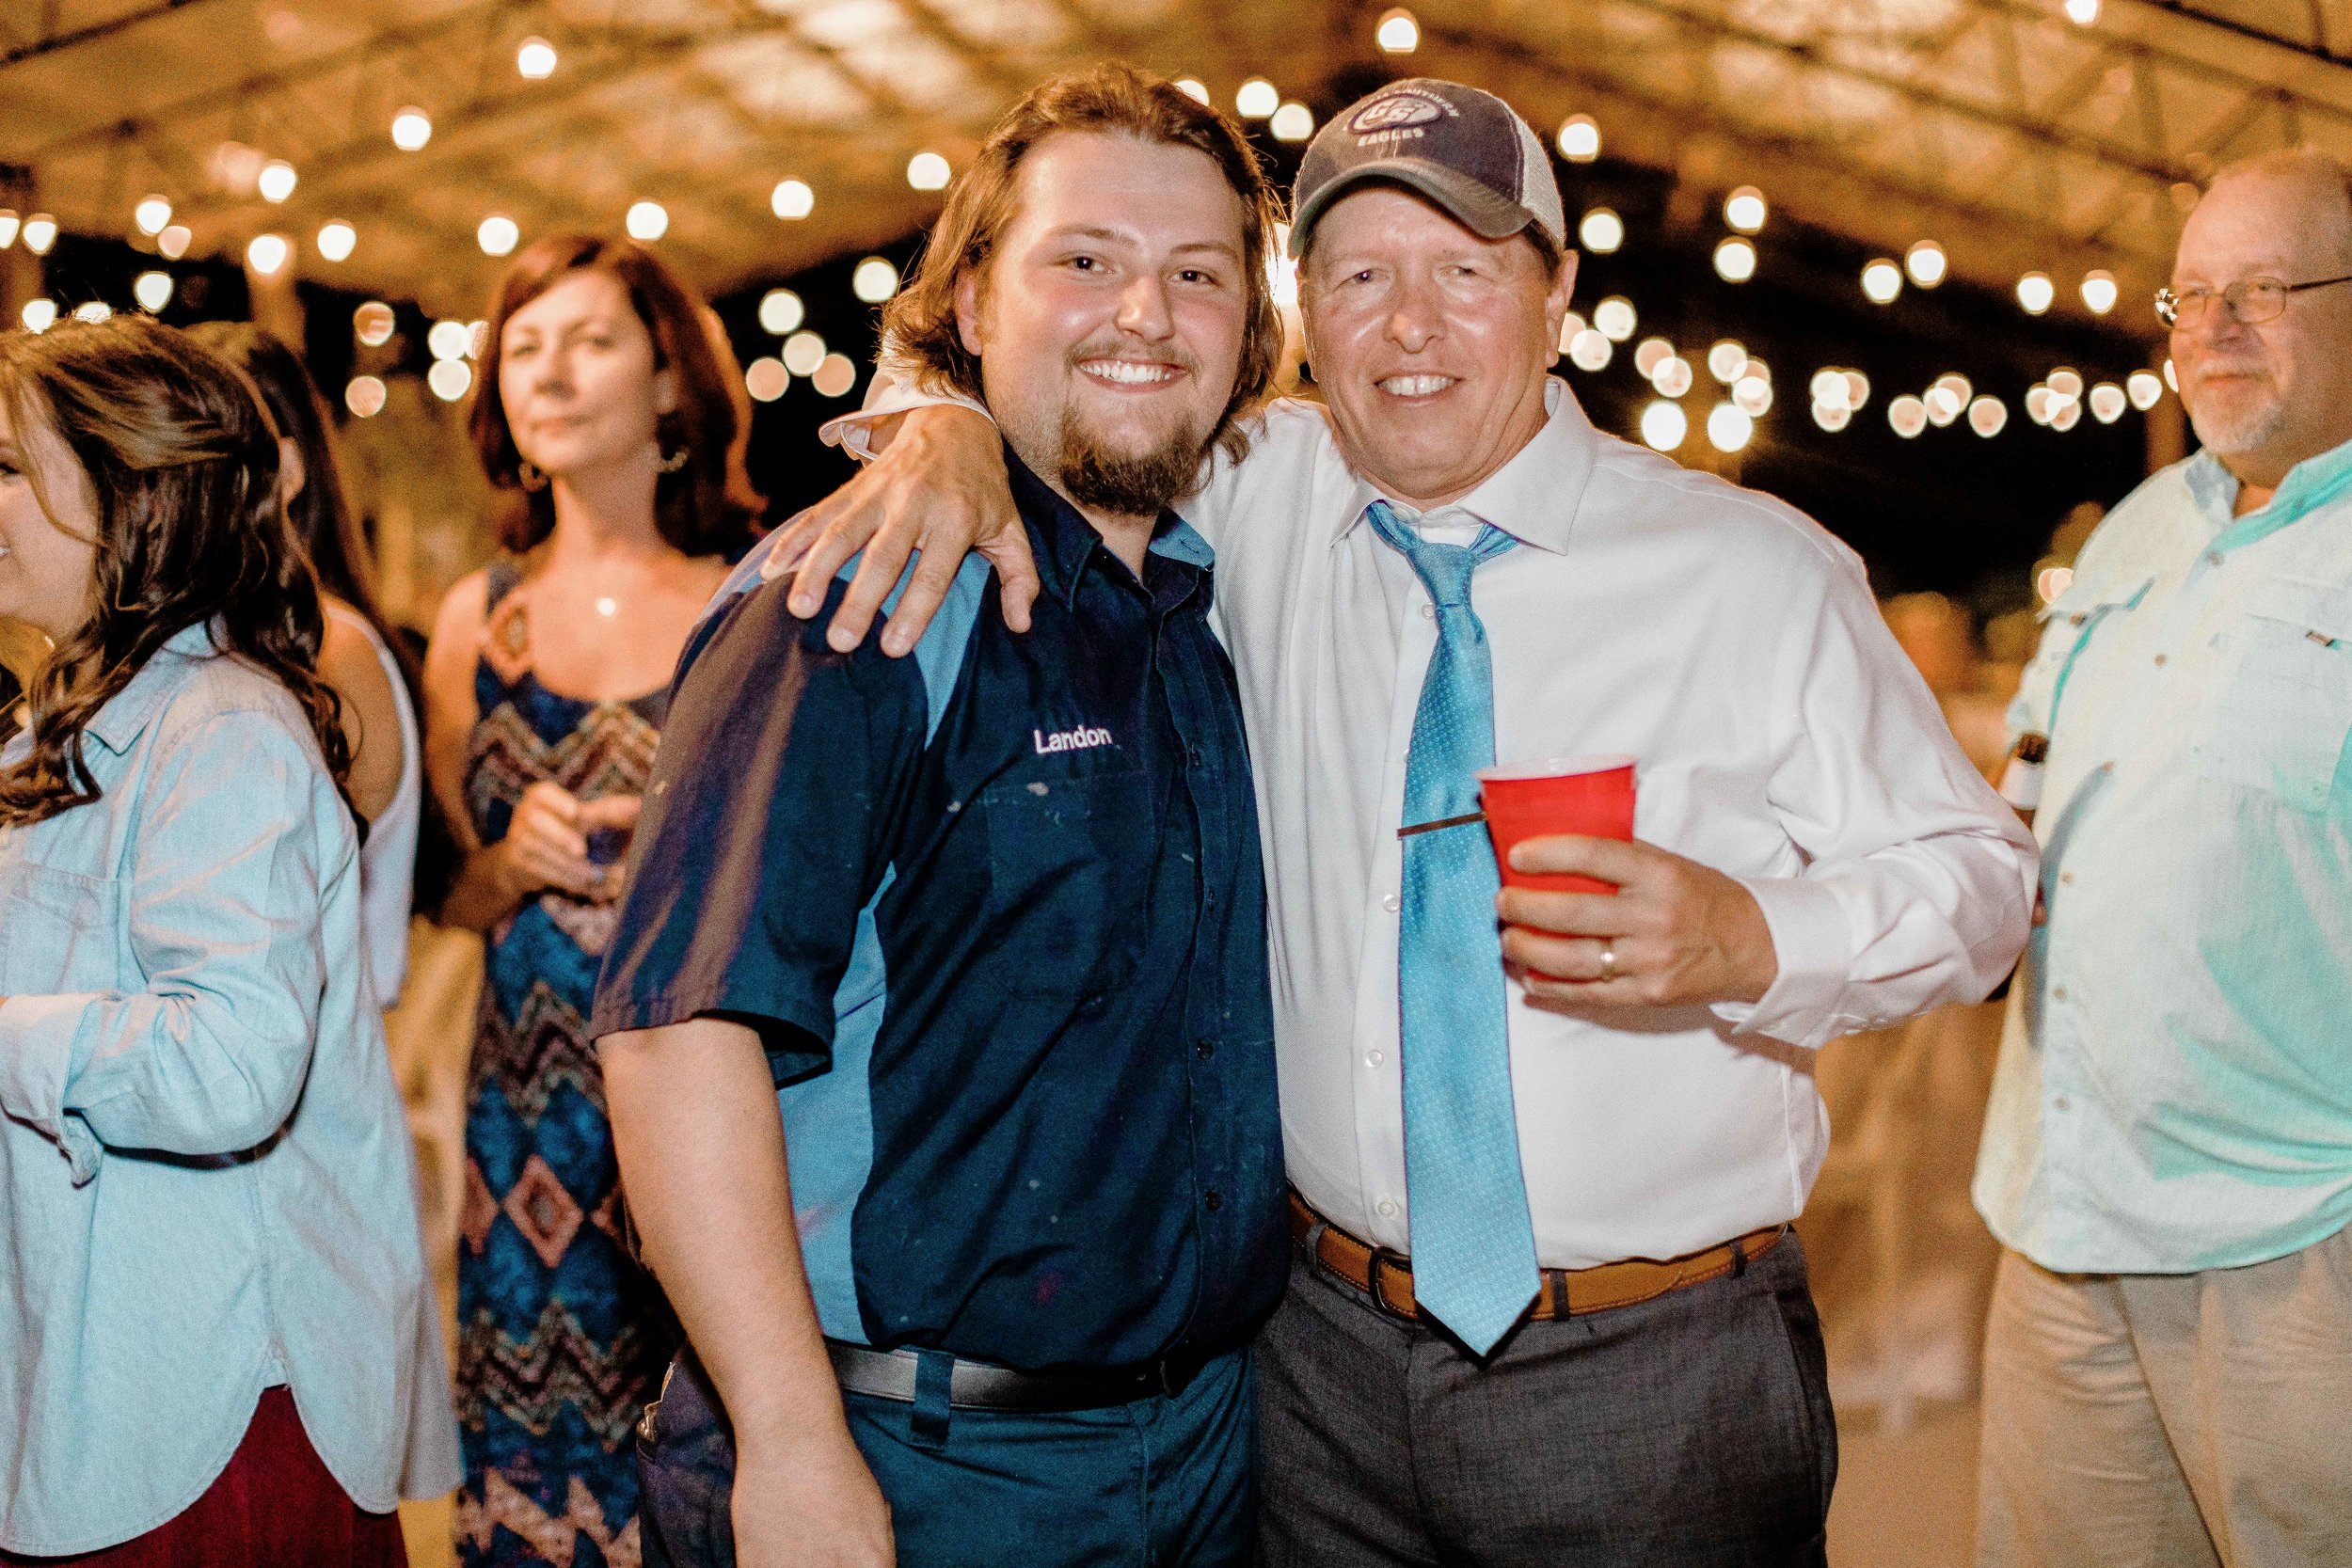 20190427-Southern Lens Photography- Savannah Wedding Photographer-Screven and Caroline-2019110.jpg